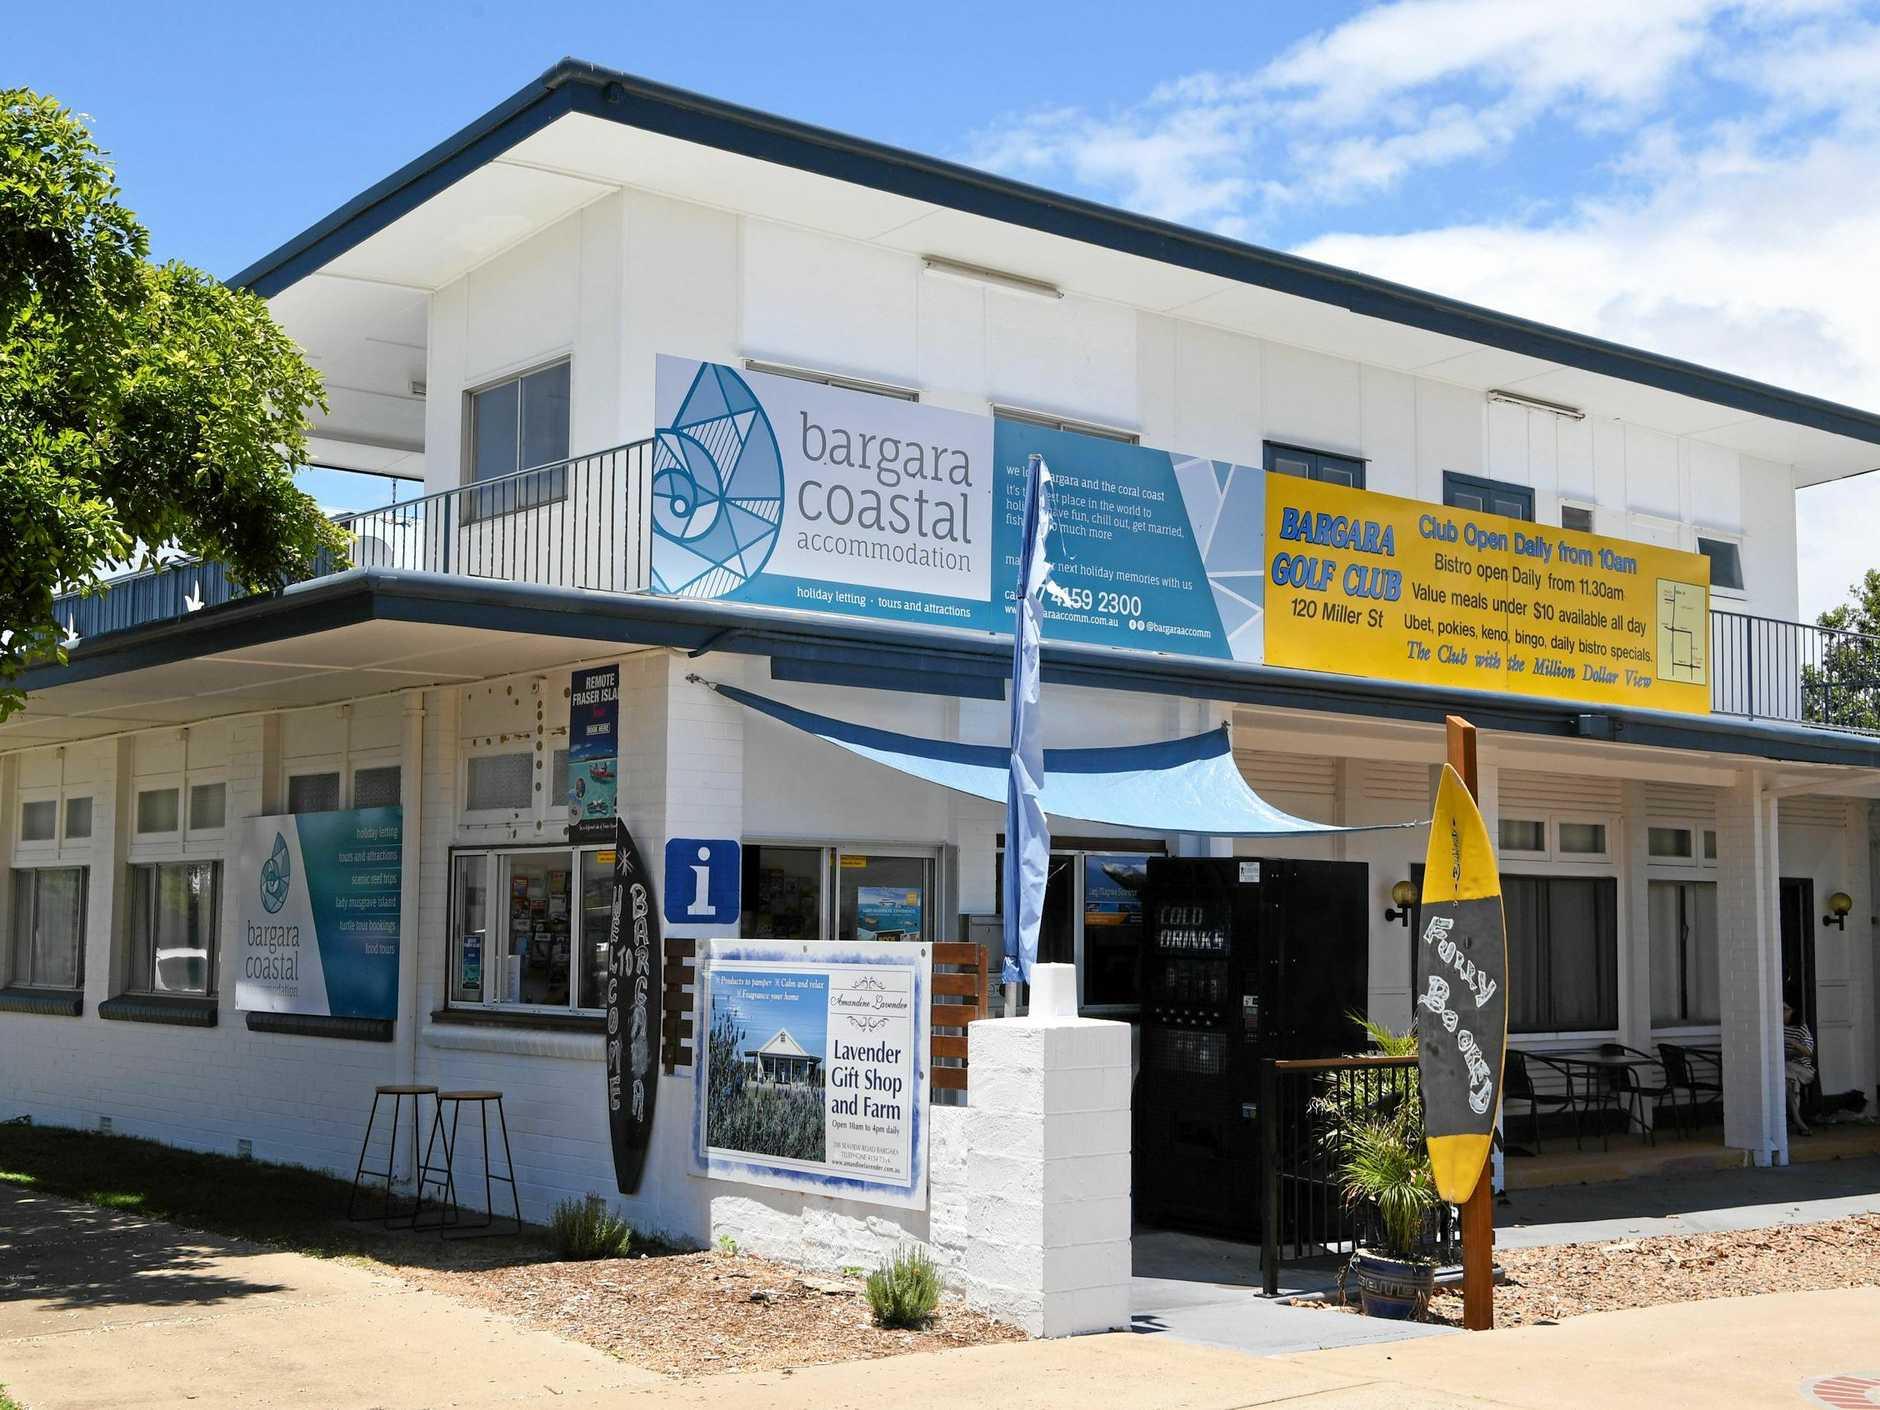 Bargara Coastal accommodation.